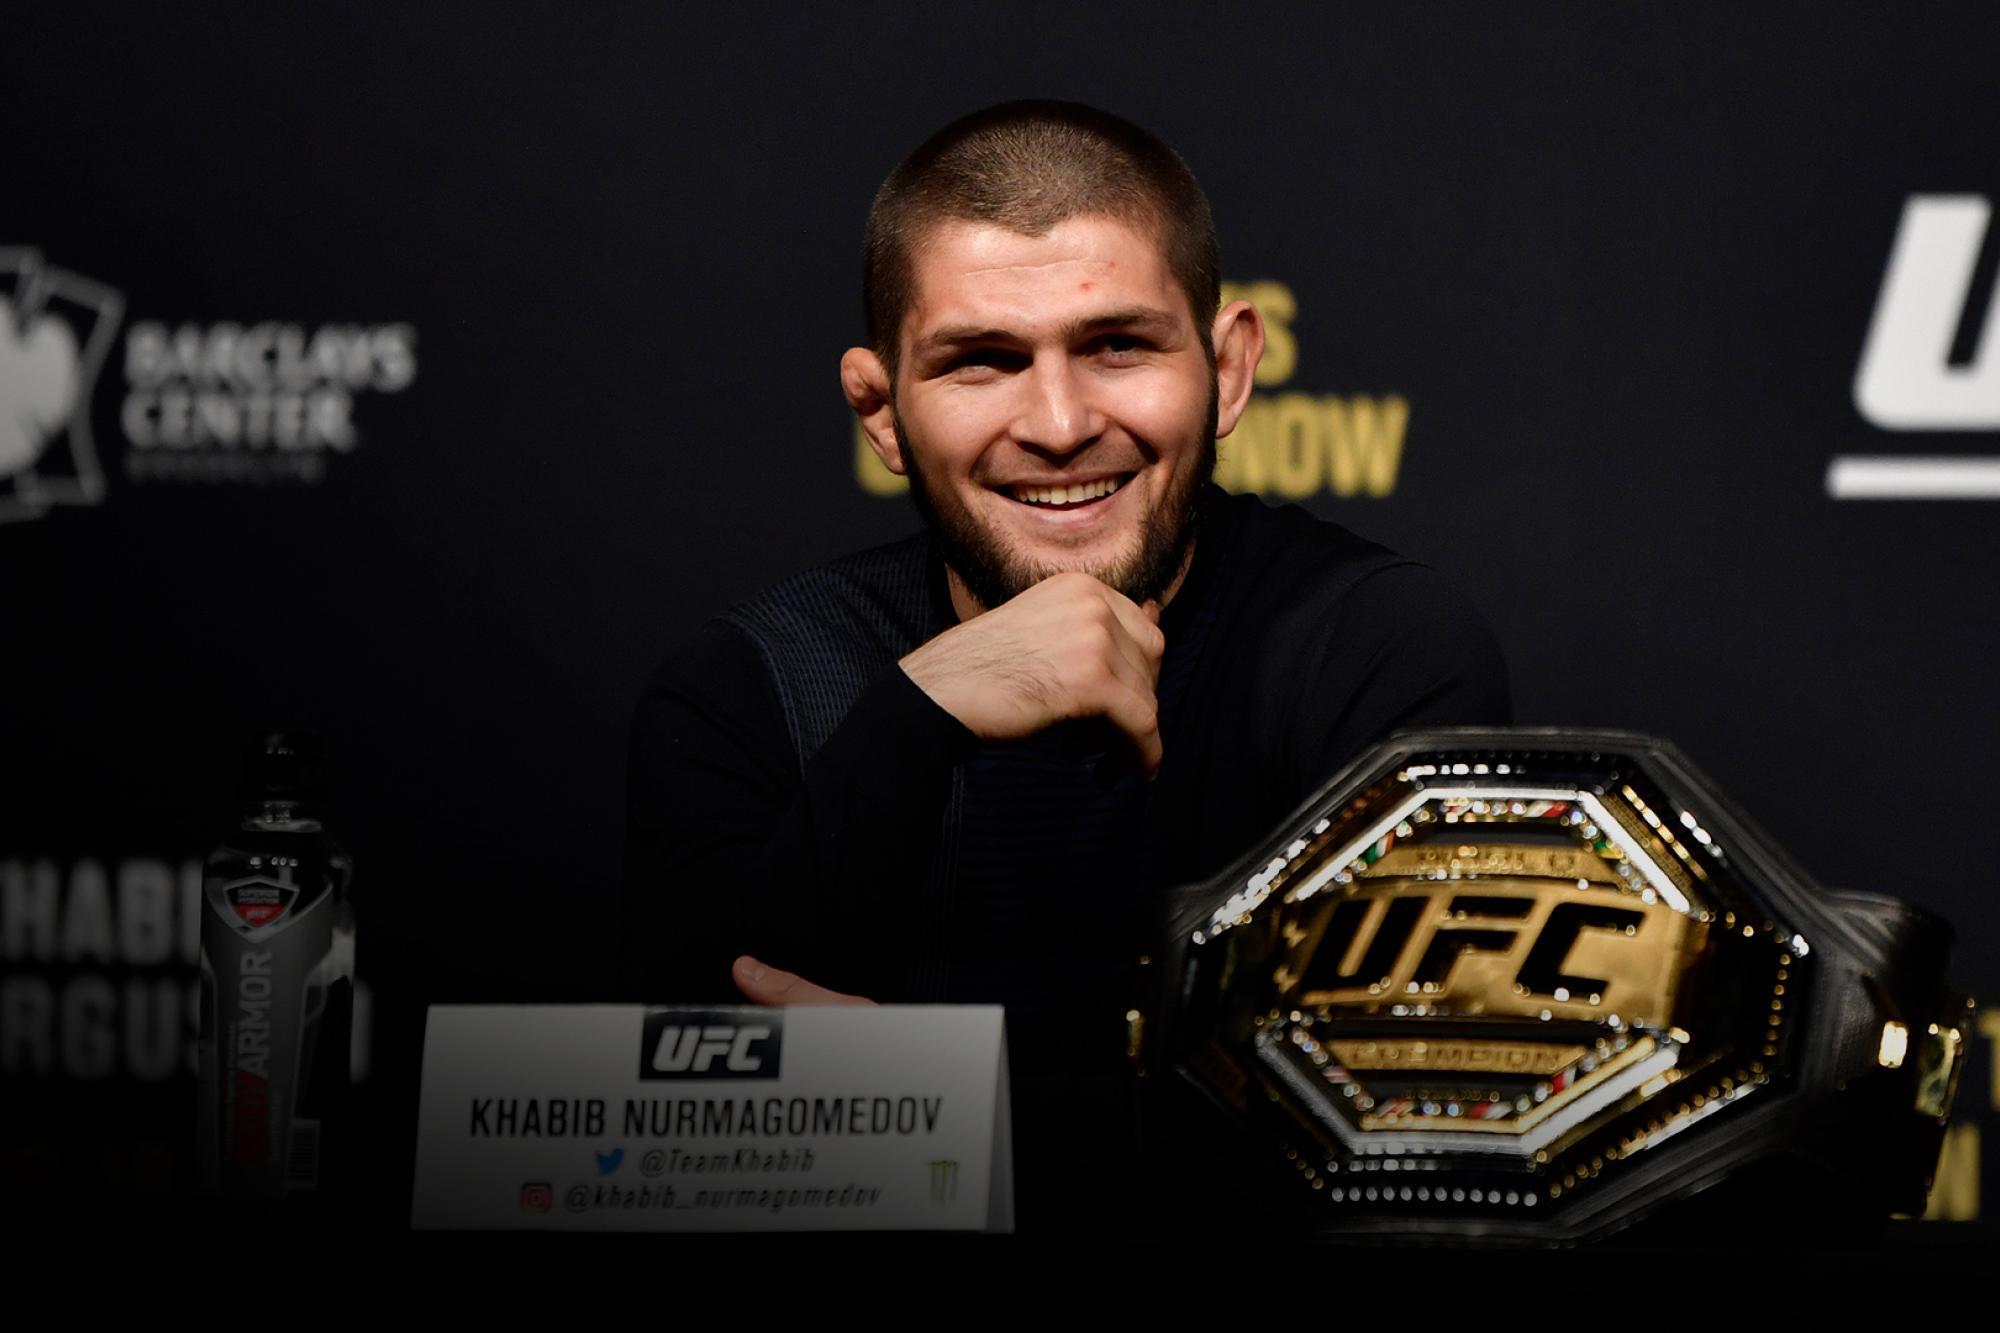 Dana White Gives An Update On Khabib Nurmagomedov | UFC